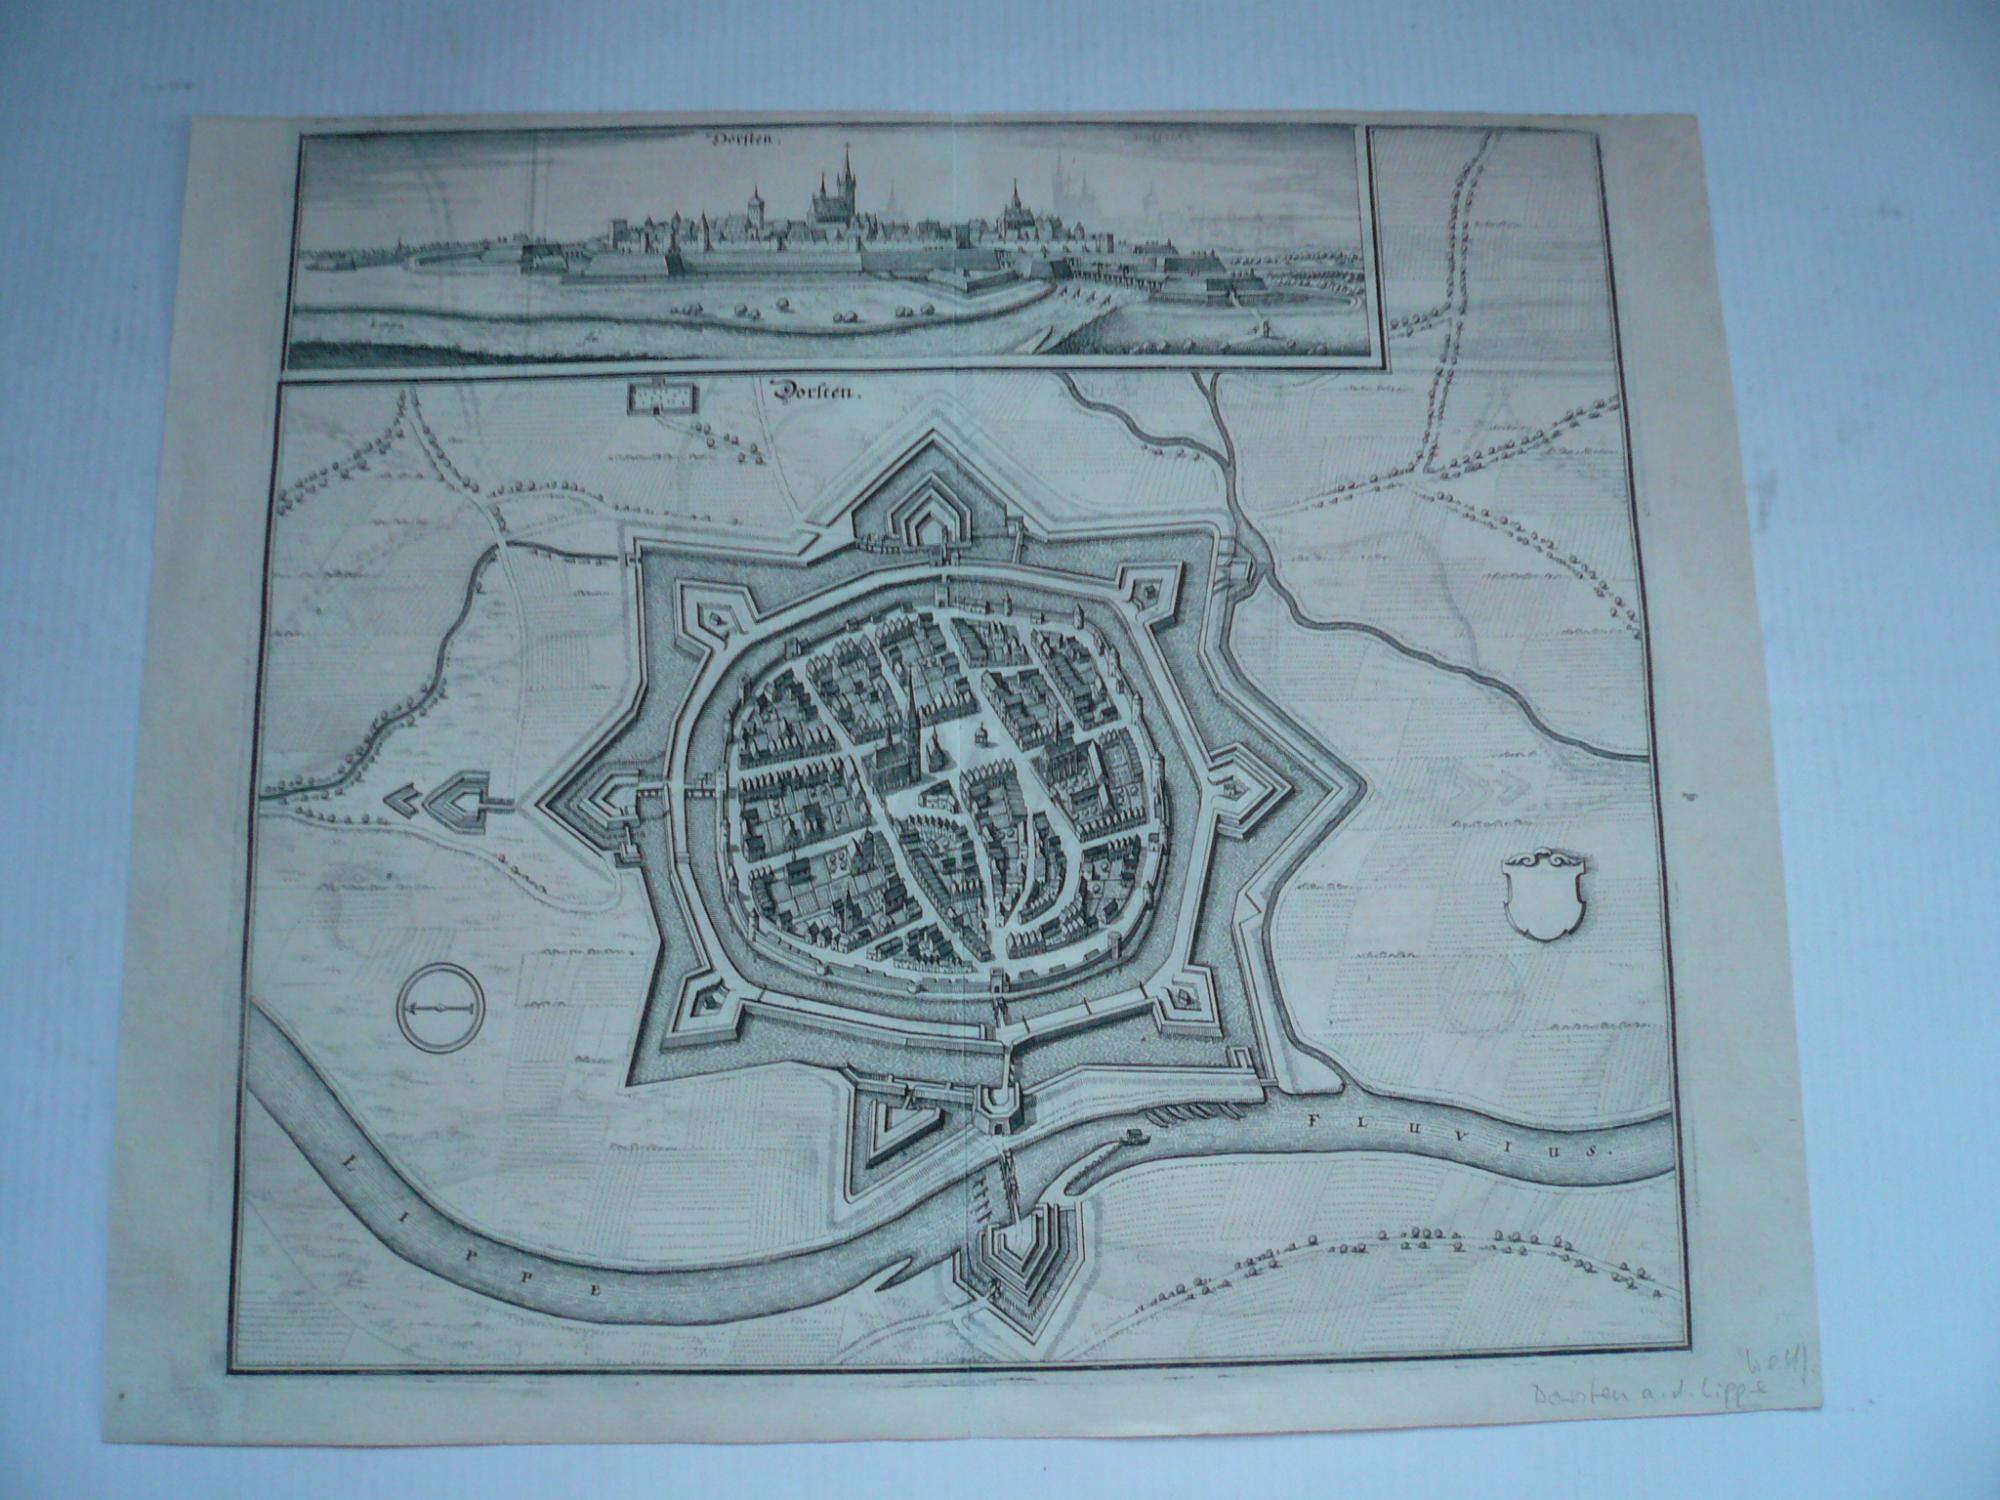 Dorsten, anno 1647, Merian Matthäus, Topographiae Westphaliae,: Merian Matthäus, 1593-1650